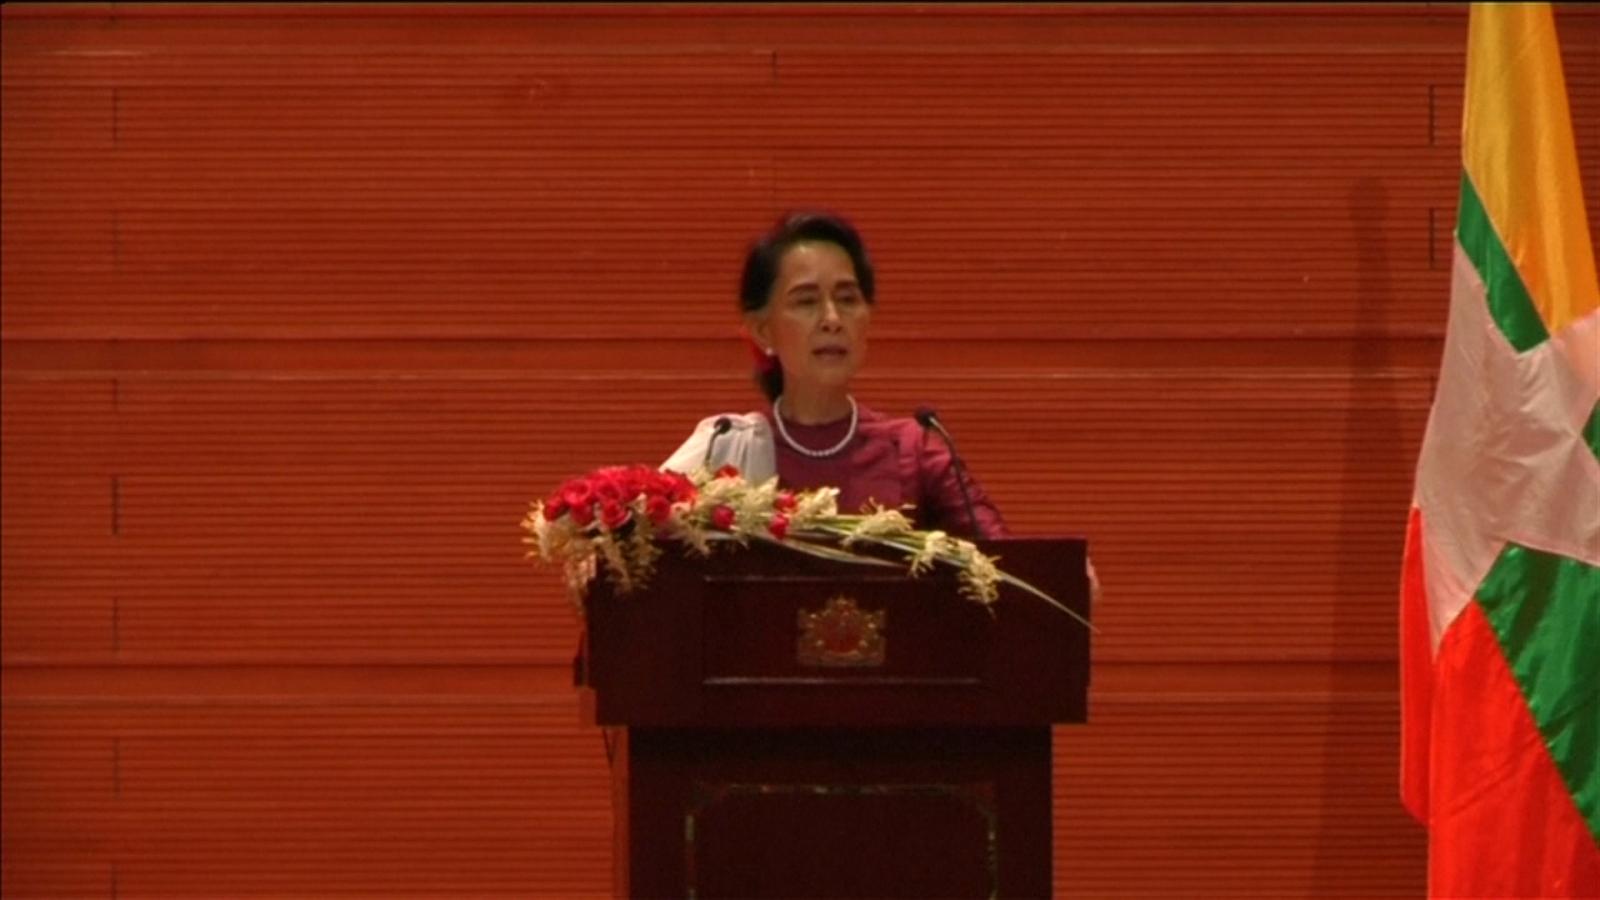 aung-san-suu-kyi-breaks-silence-on-rohingya-crisis